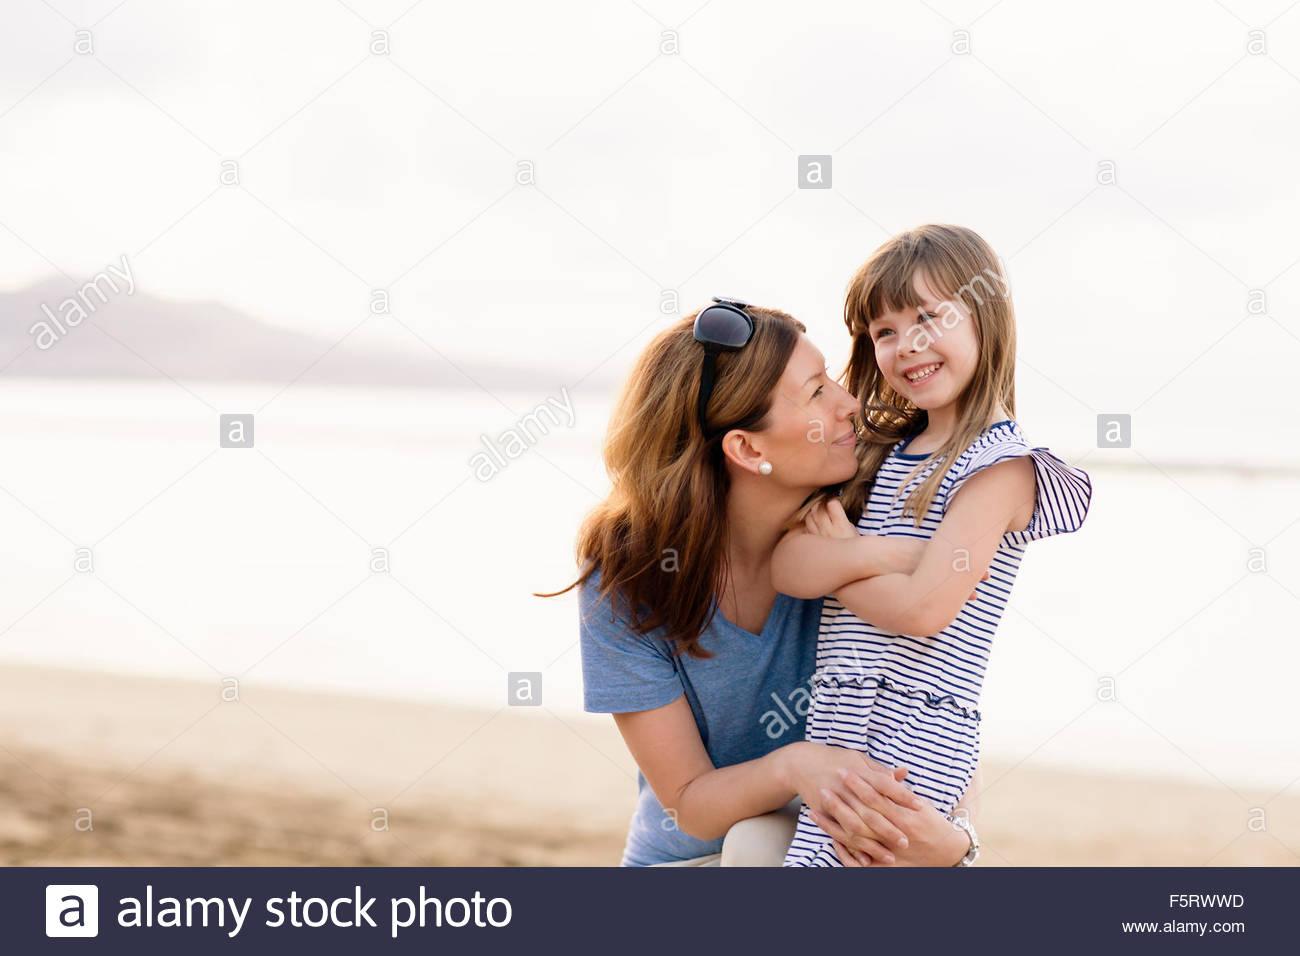 Spain, Las Palmas, Mother and daughter (4-5) - Stock Image